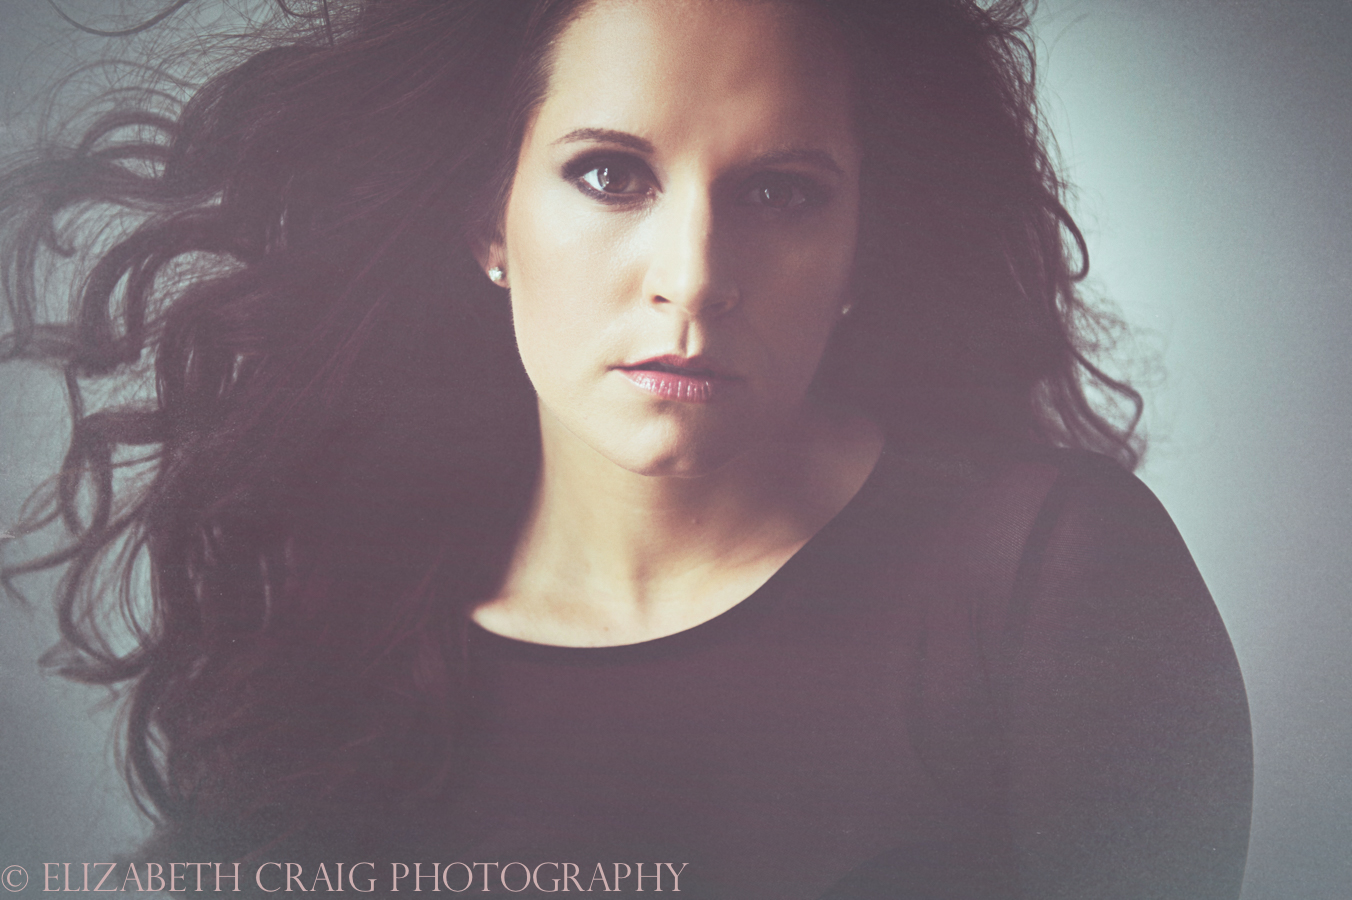 Elizabeth Craig Beauty Boudoir Photography   Pittsburgh-002-2